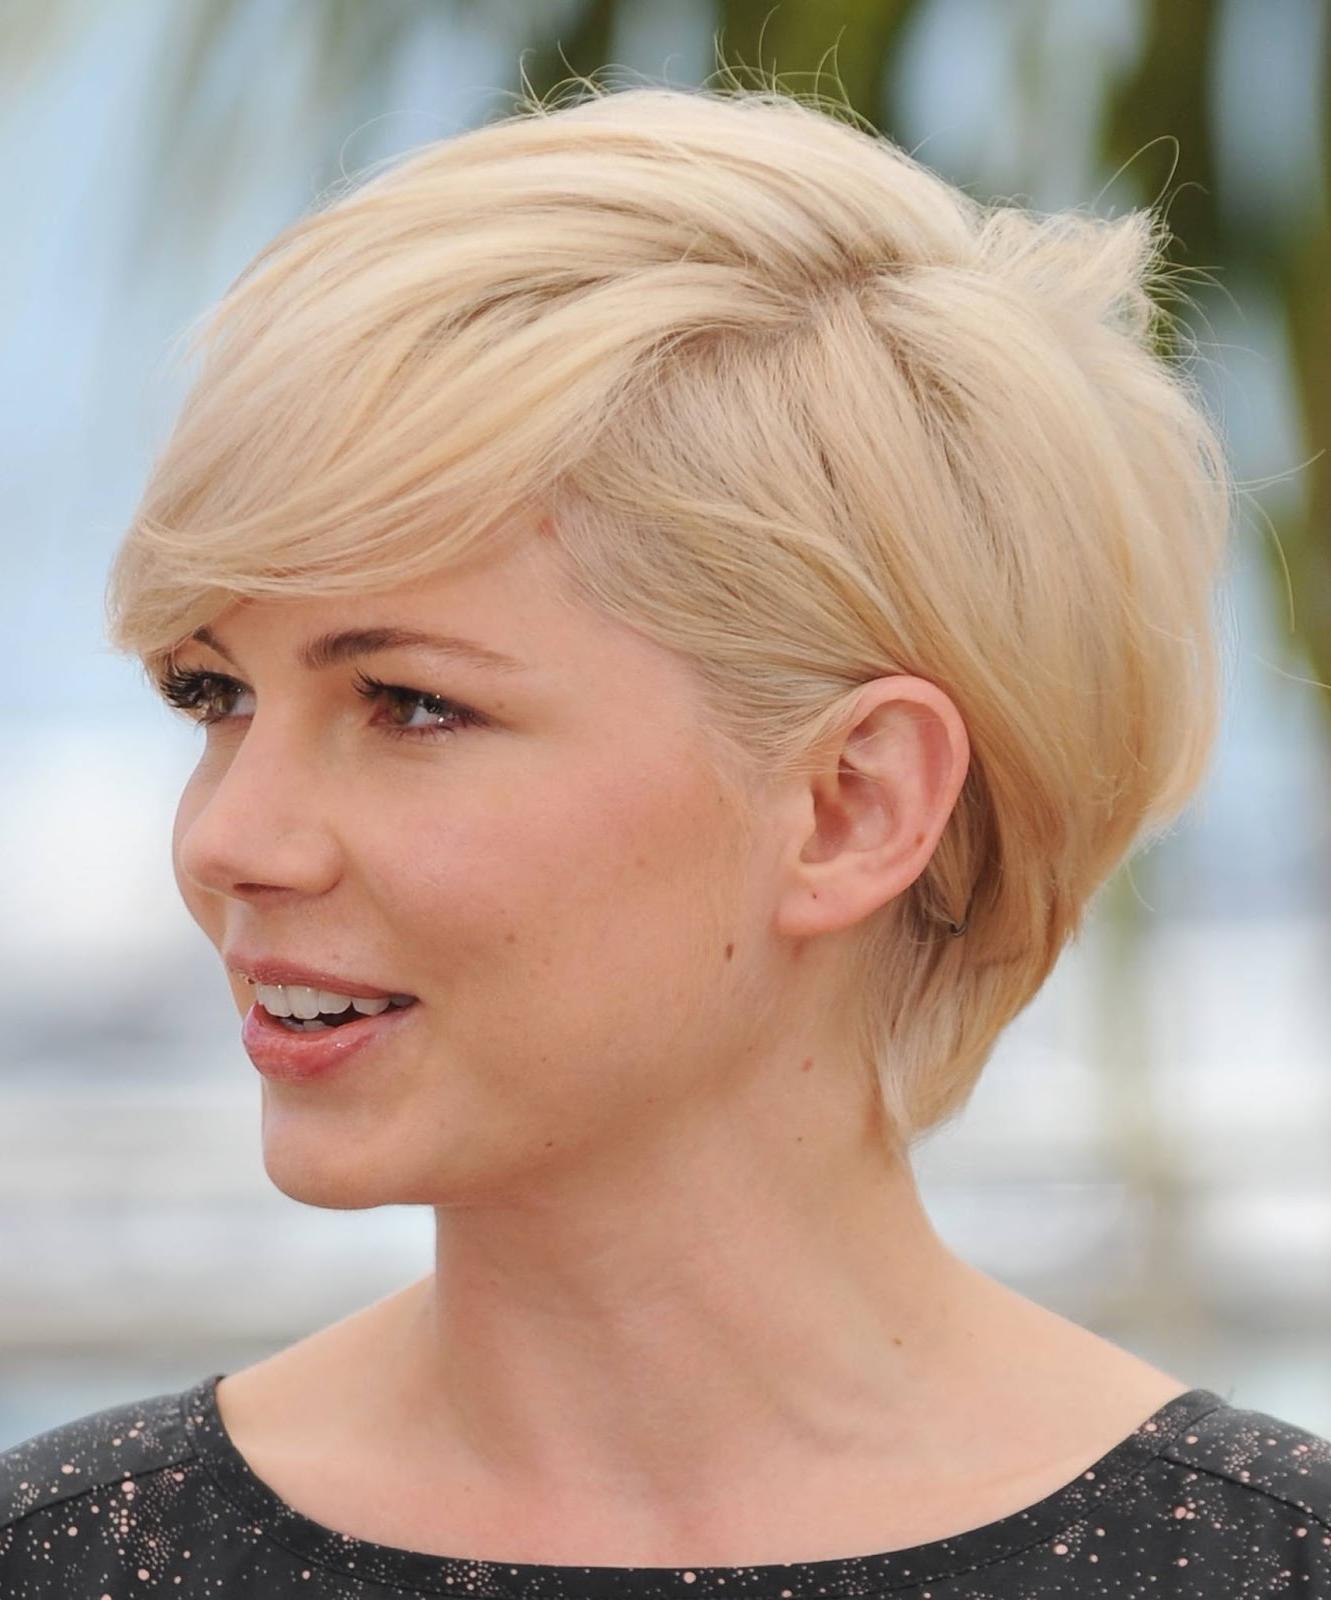 Trendy For Short Hairstyles: Short Blonde Hairstyles Within Short Blonde Hair With Bangs (View 20 of 25)